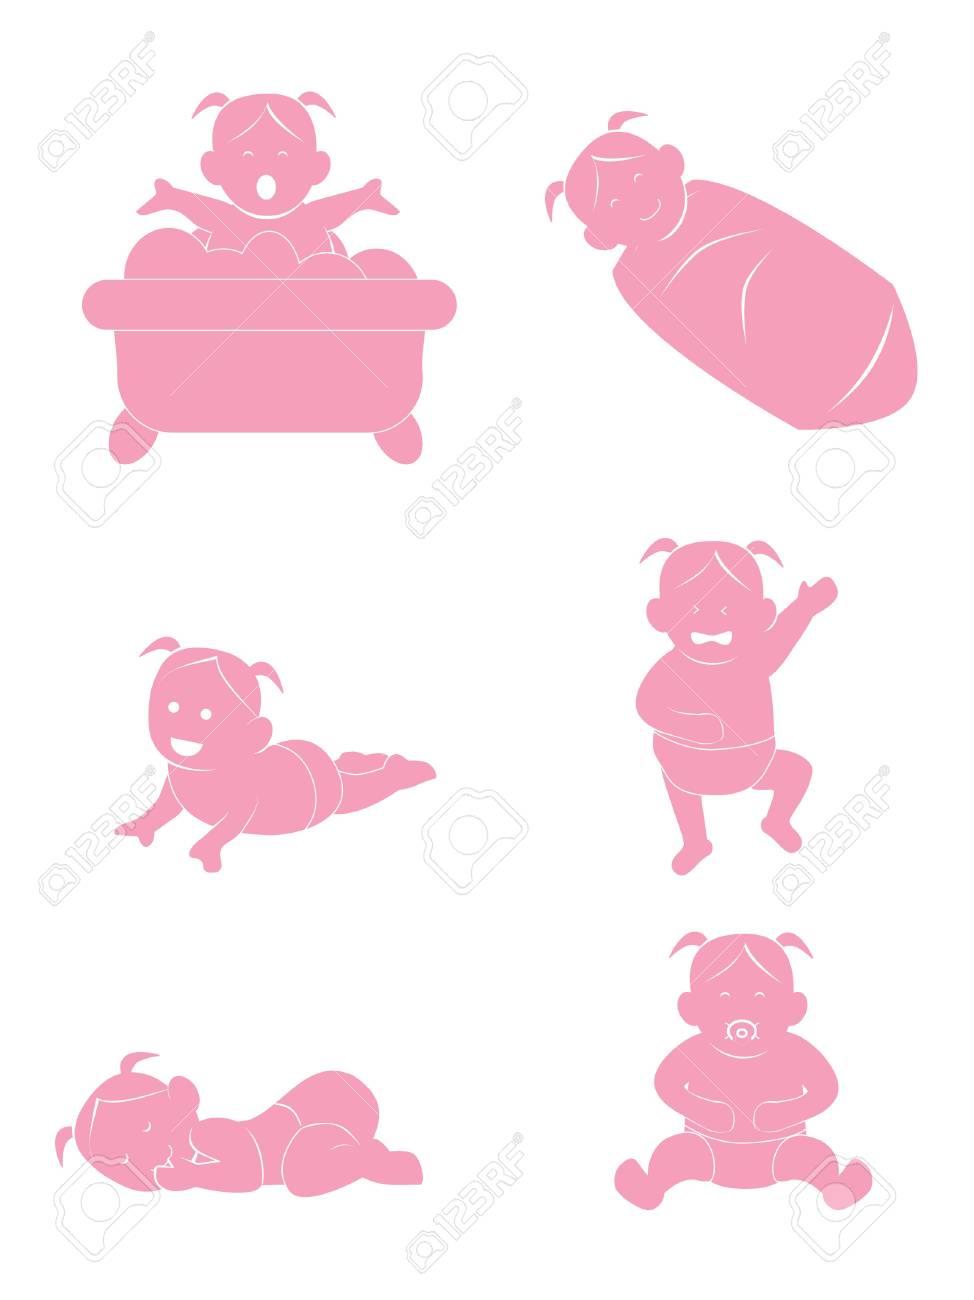 Baby Girl Stock Vector - 14413897